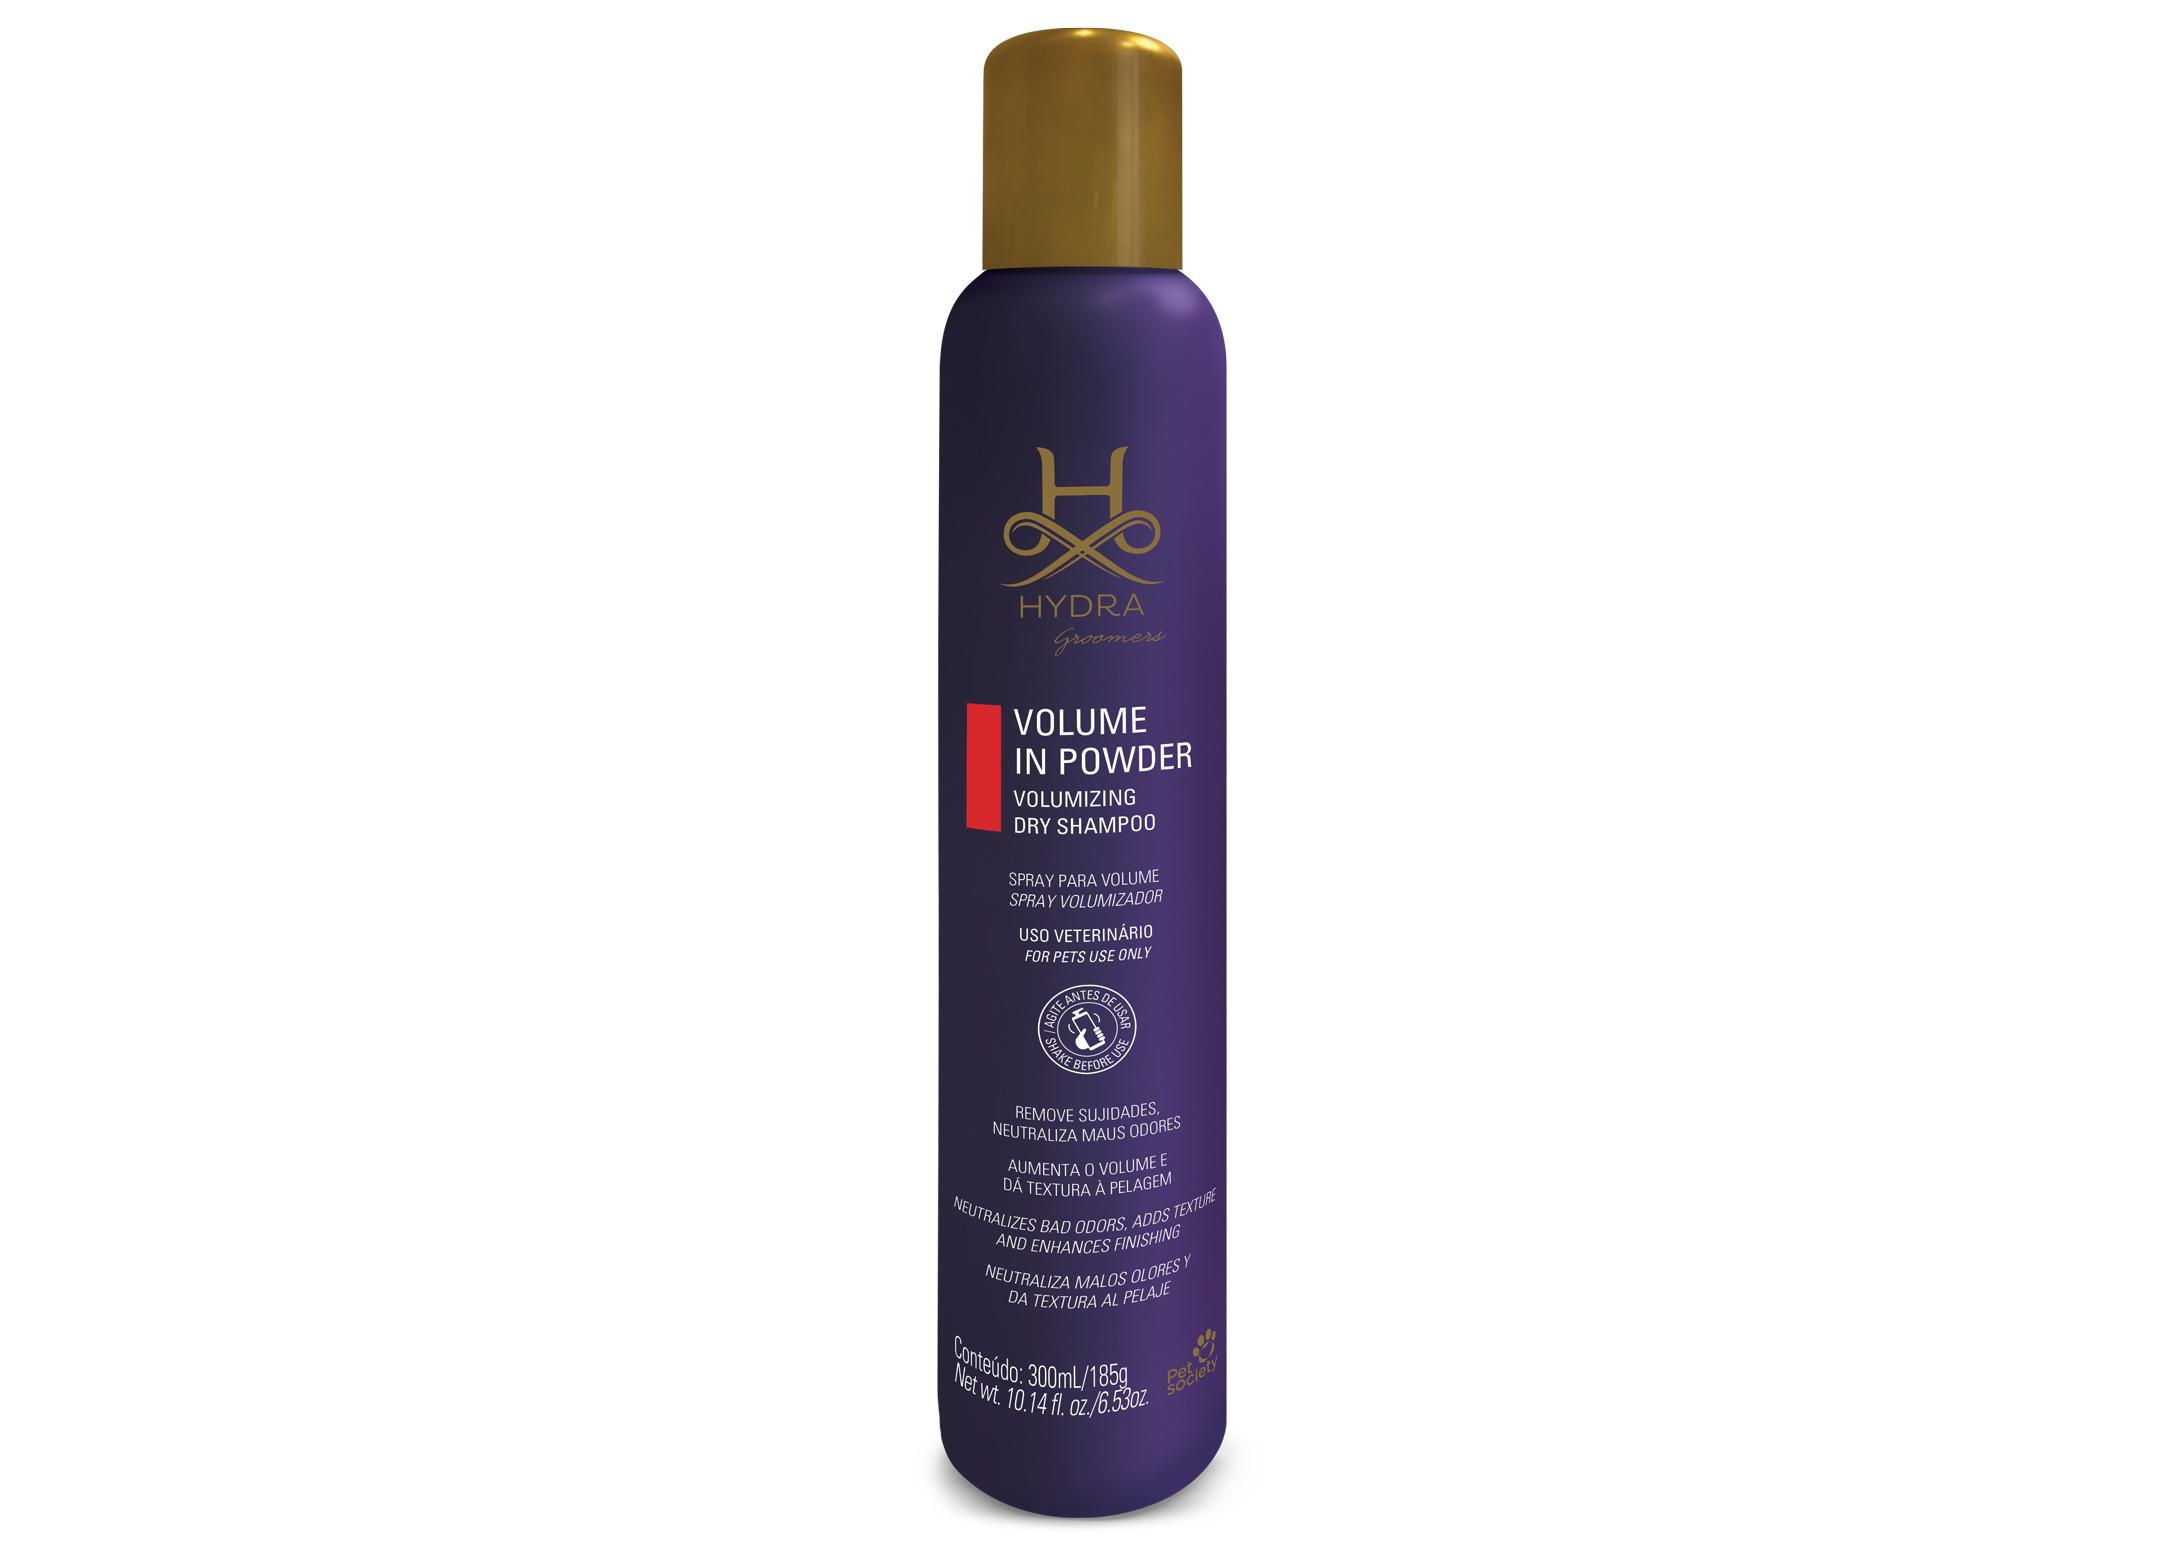 Hydra Volume in Powder spray 300 ml - Volume droogshampoo